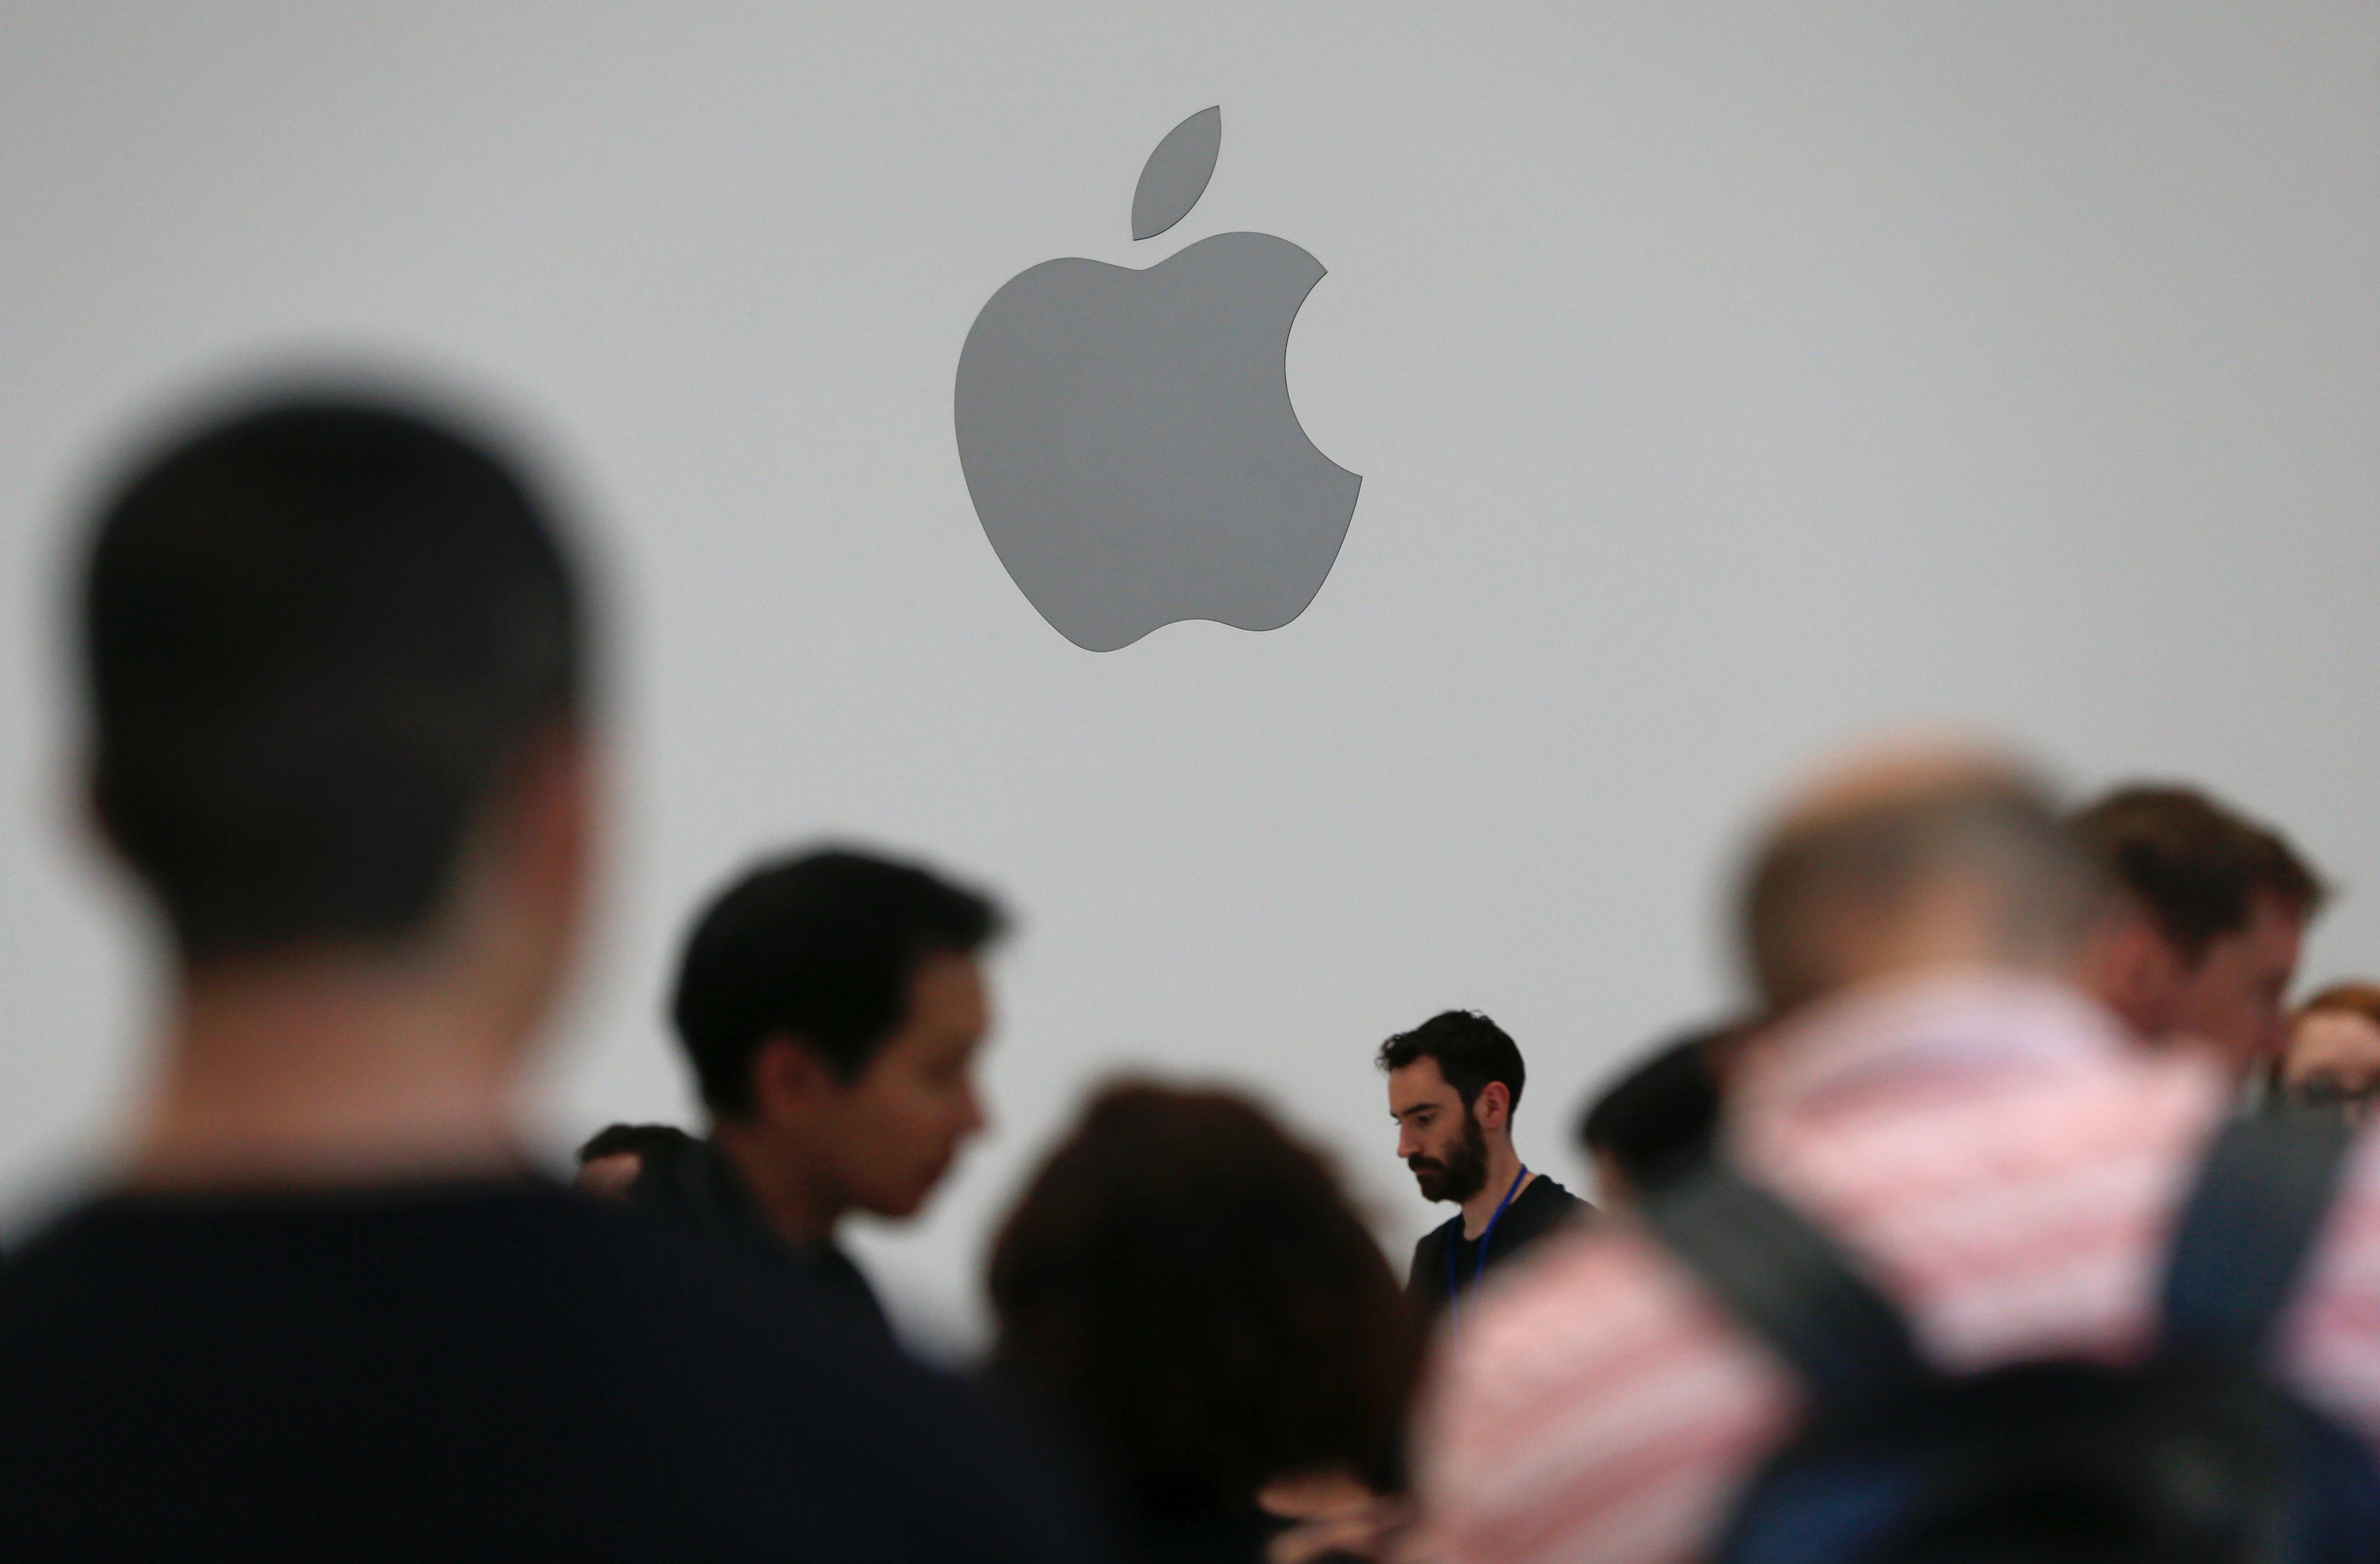 Американец подал в суд на Apple из-за монополии на игры